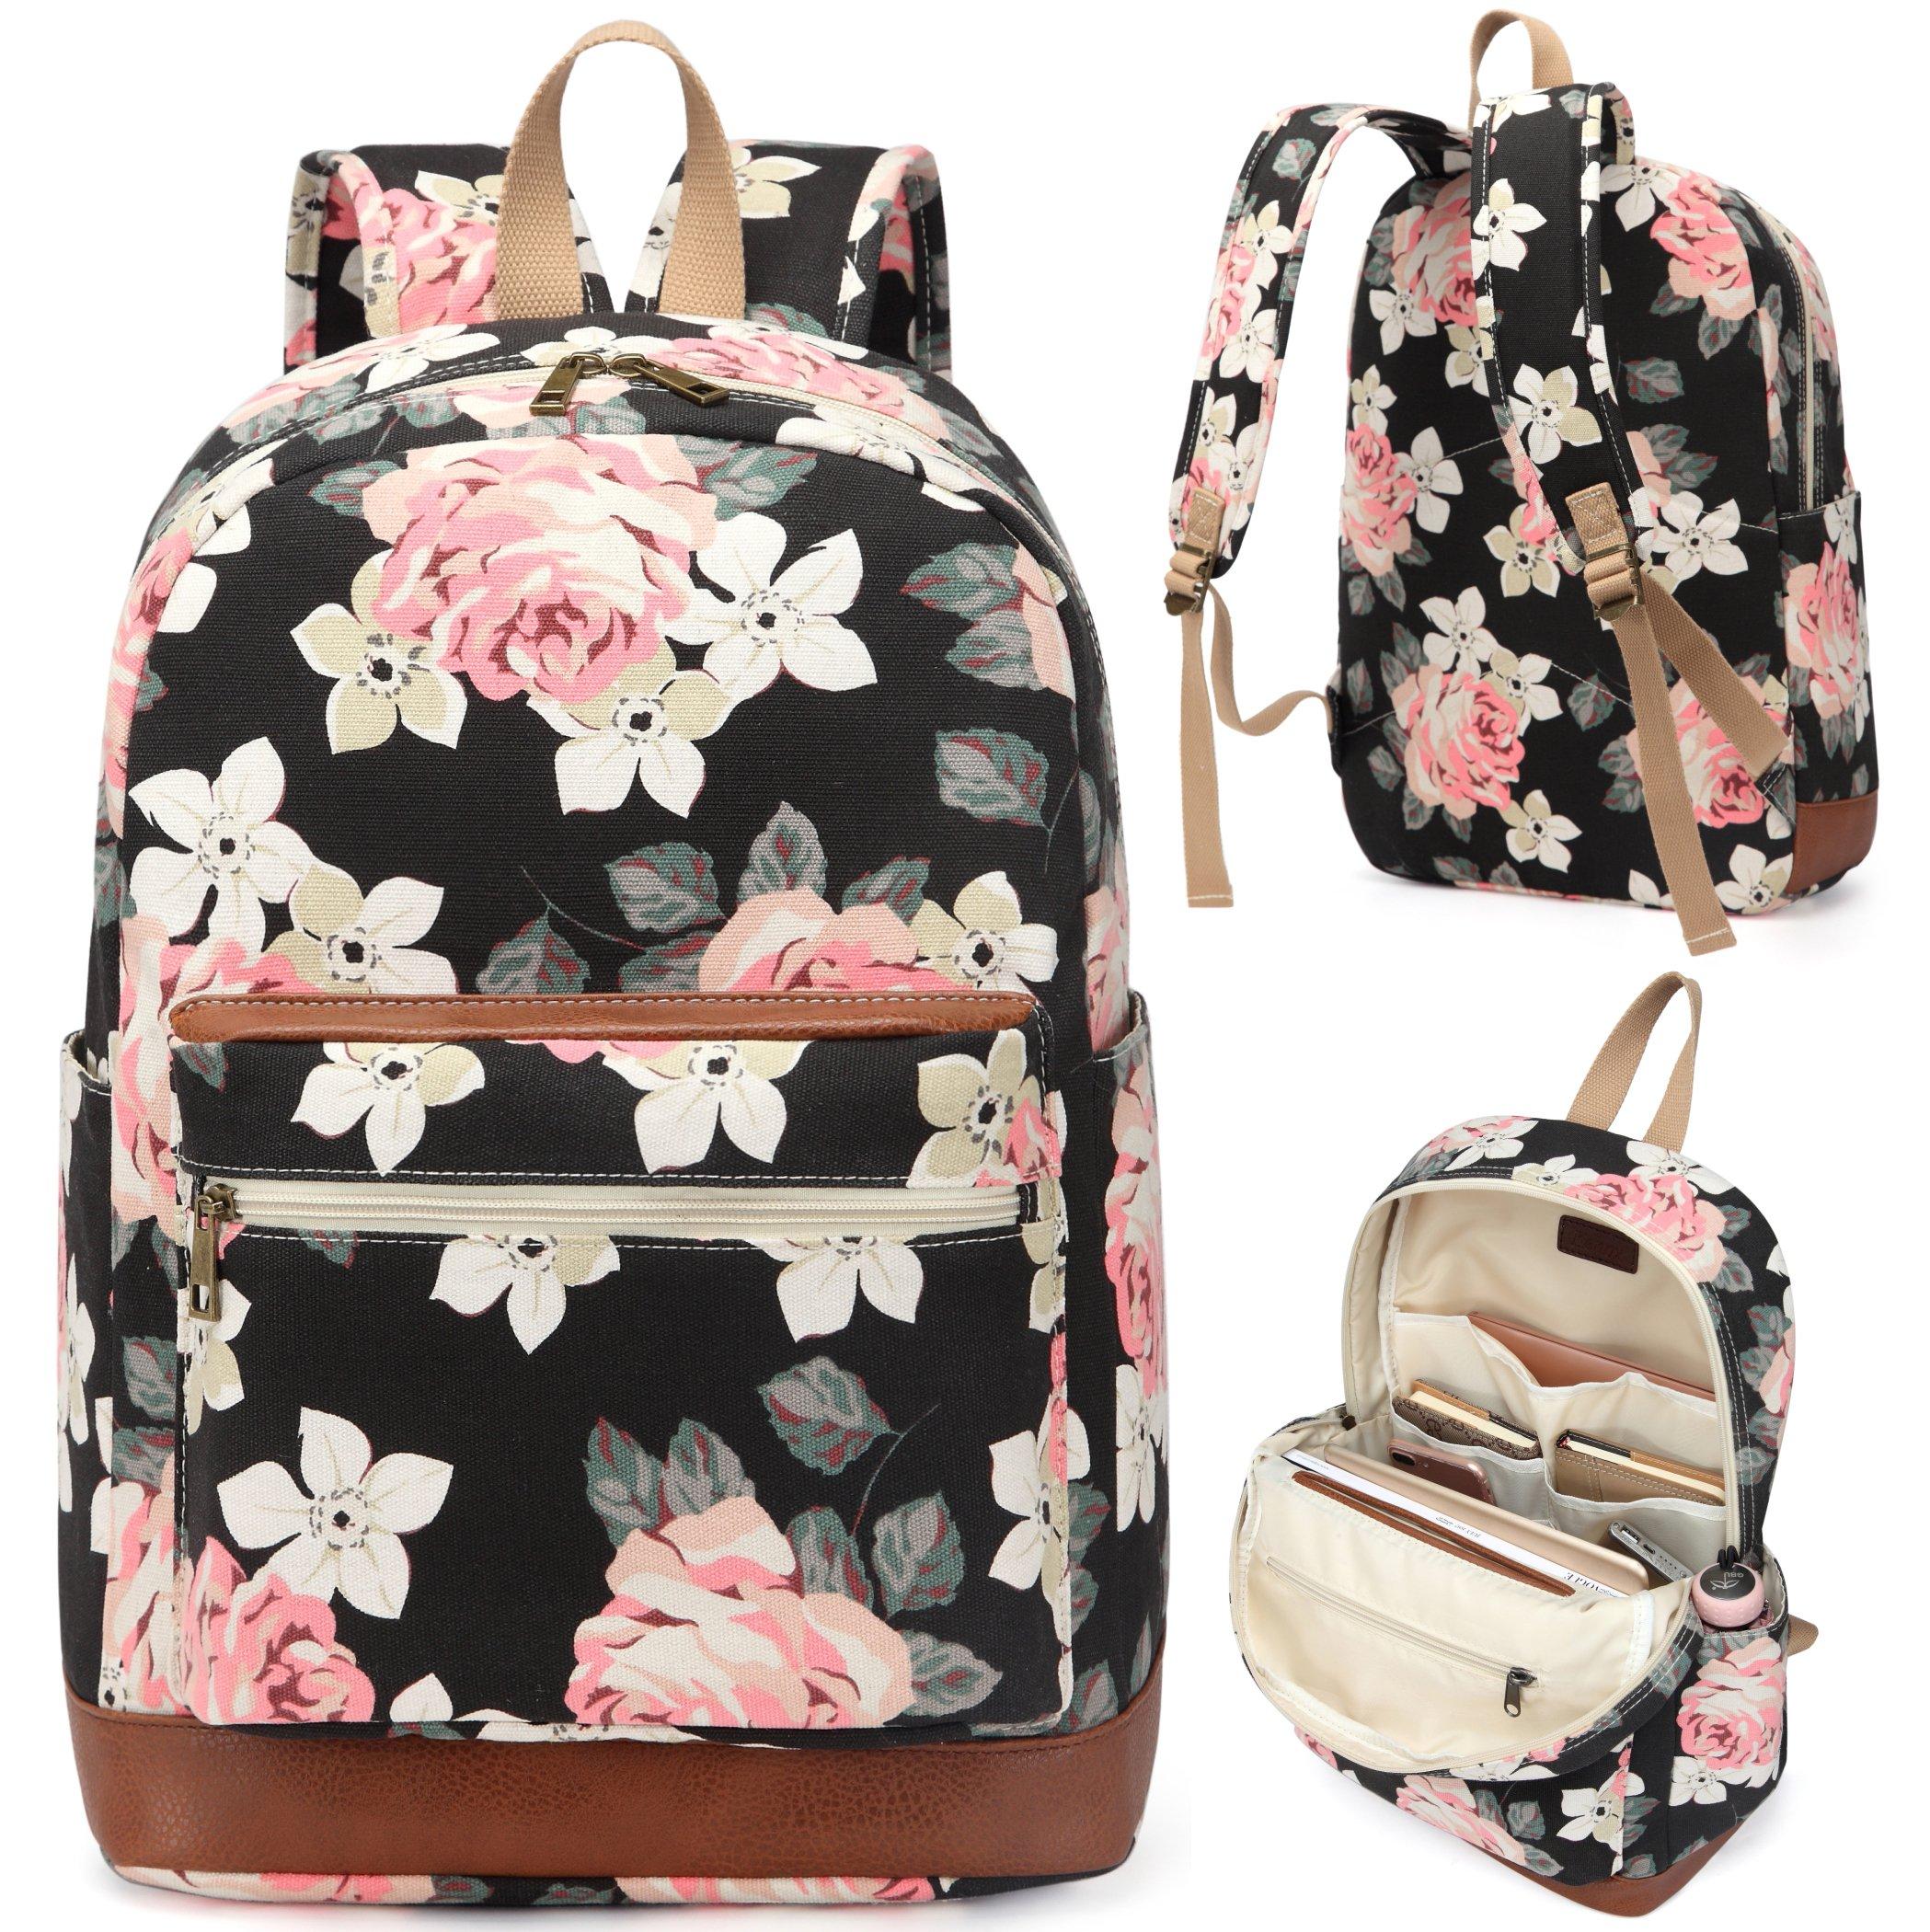 9a6185d0e2cd Get Quotations · Kenox Girl s School Rucksack College Bookbag Lady Travel  Backpack 14Inch Laptop Bag (Floral)